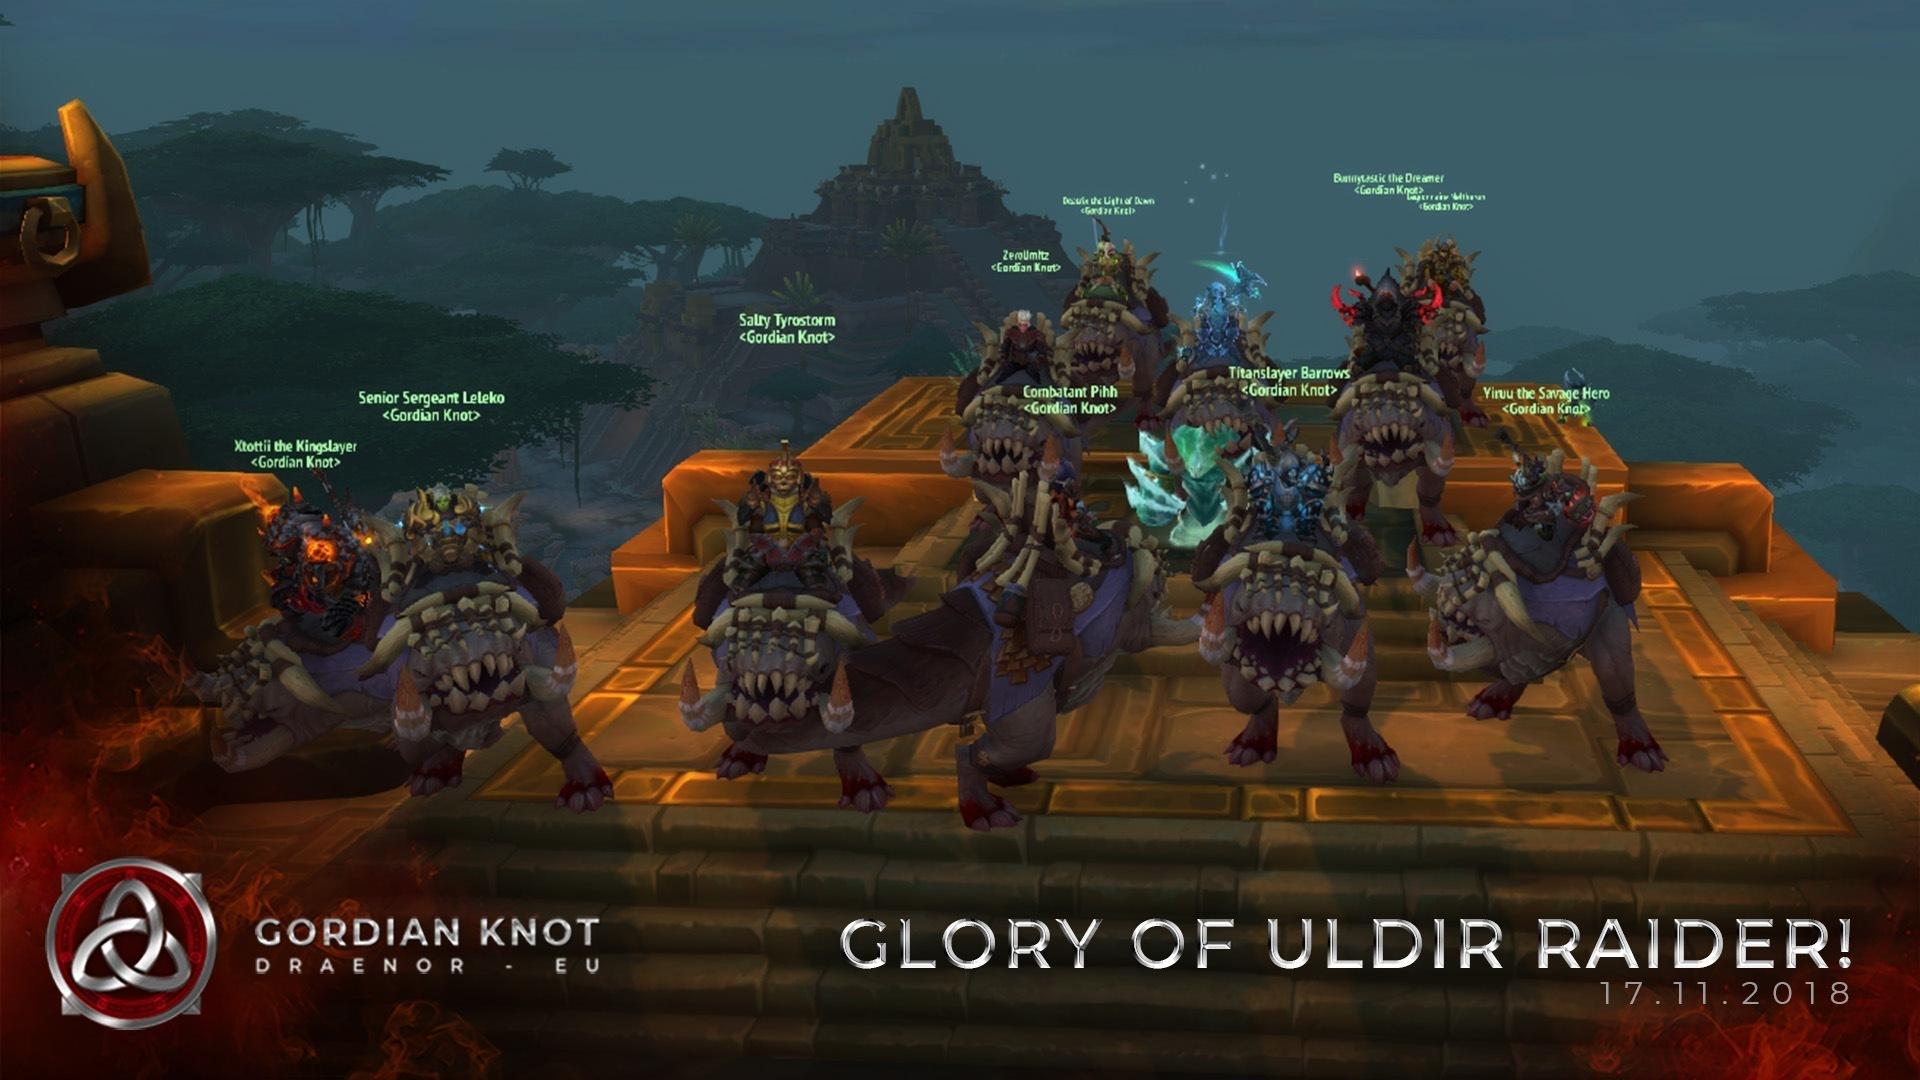 Glory of the Uldir Raider